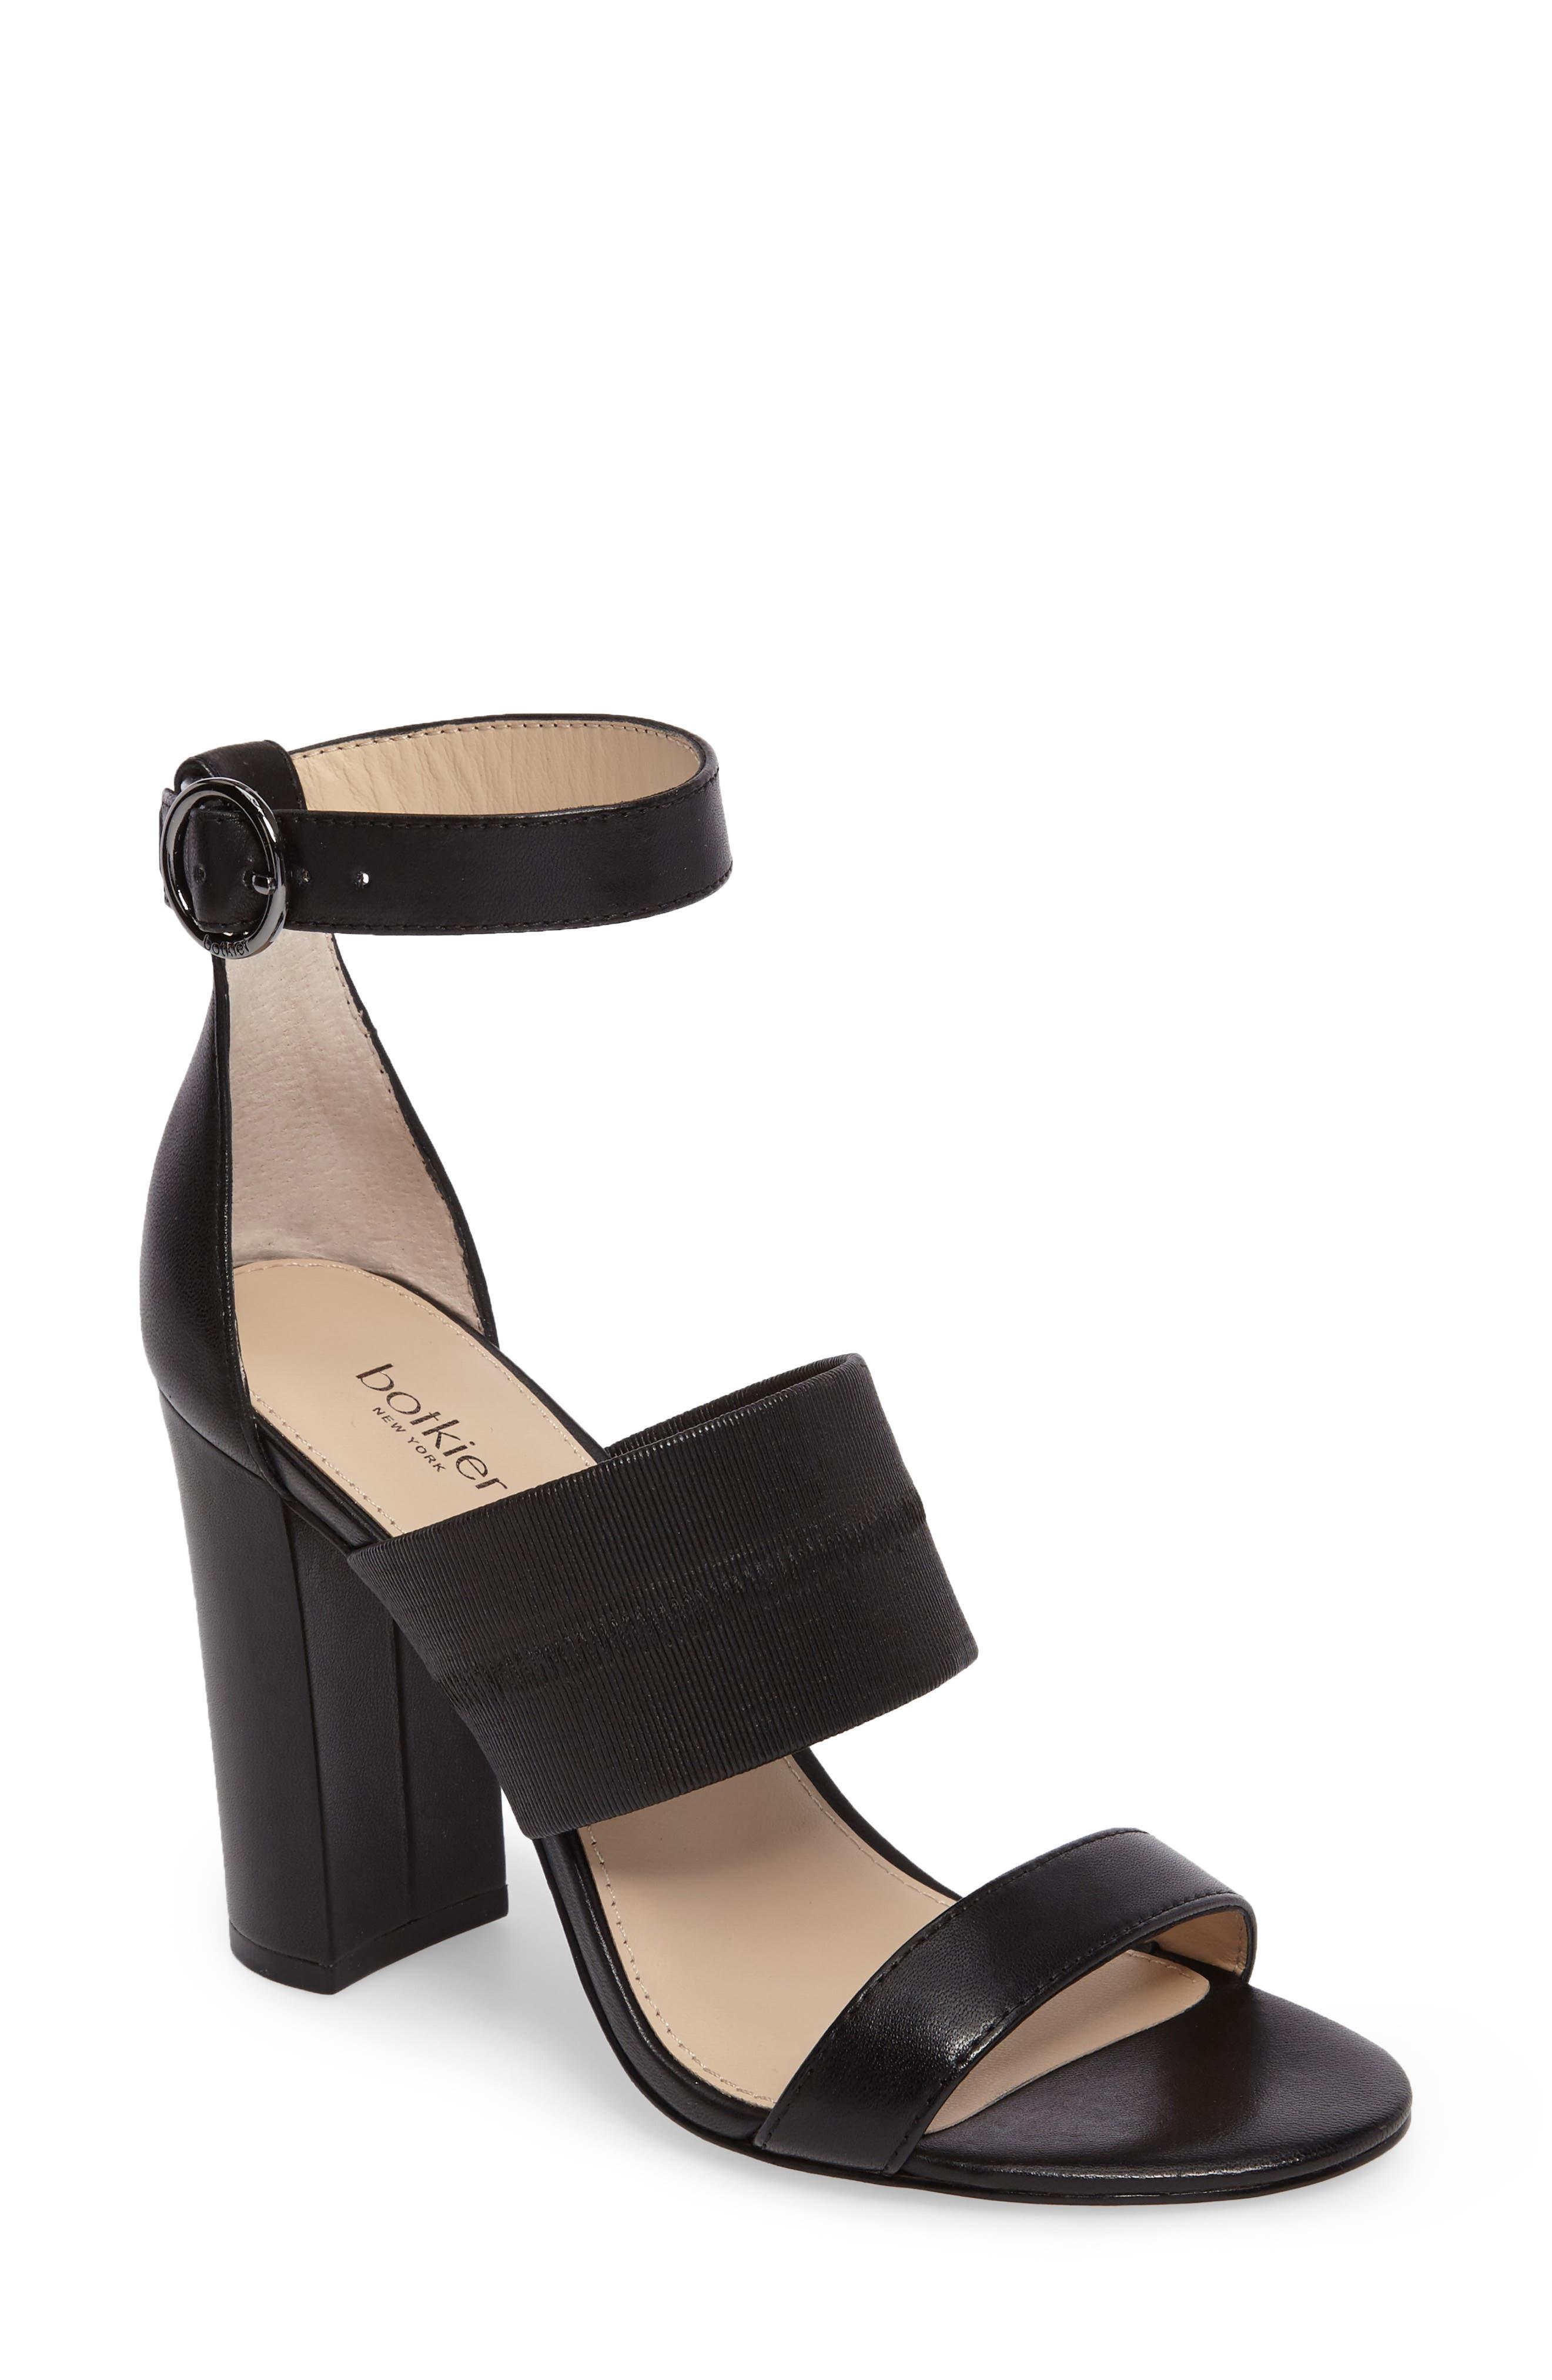 Gisella Ankle Strap Sandal,                             Main thumbnail 1, color,                             Black Leather